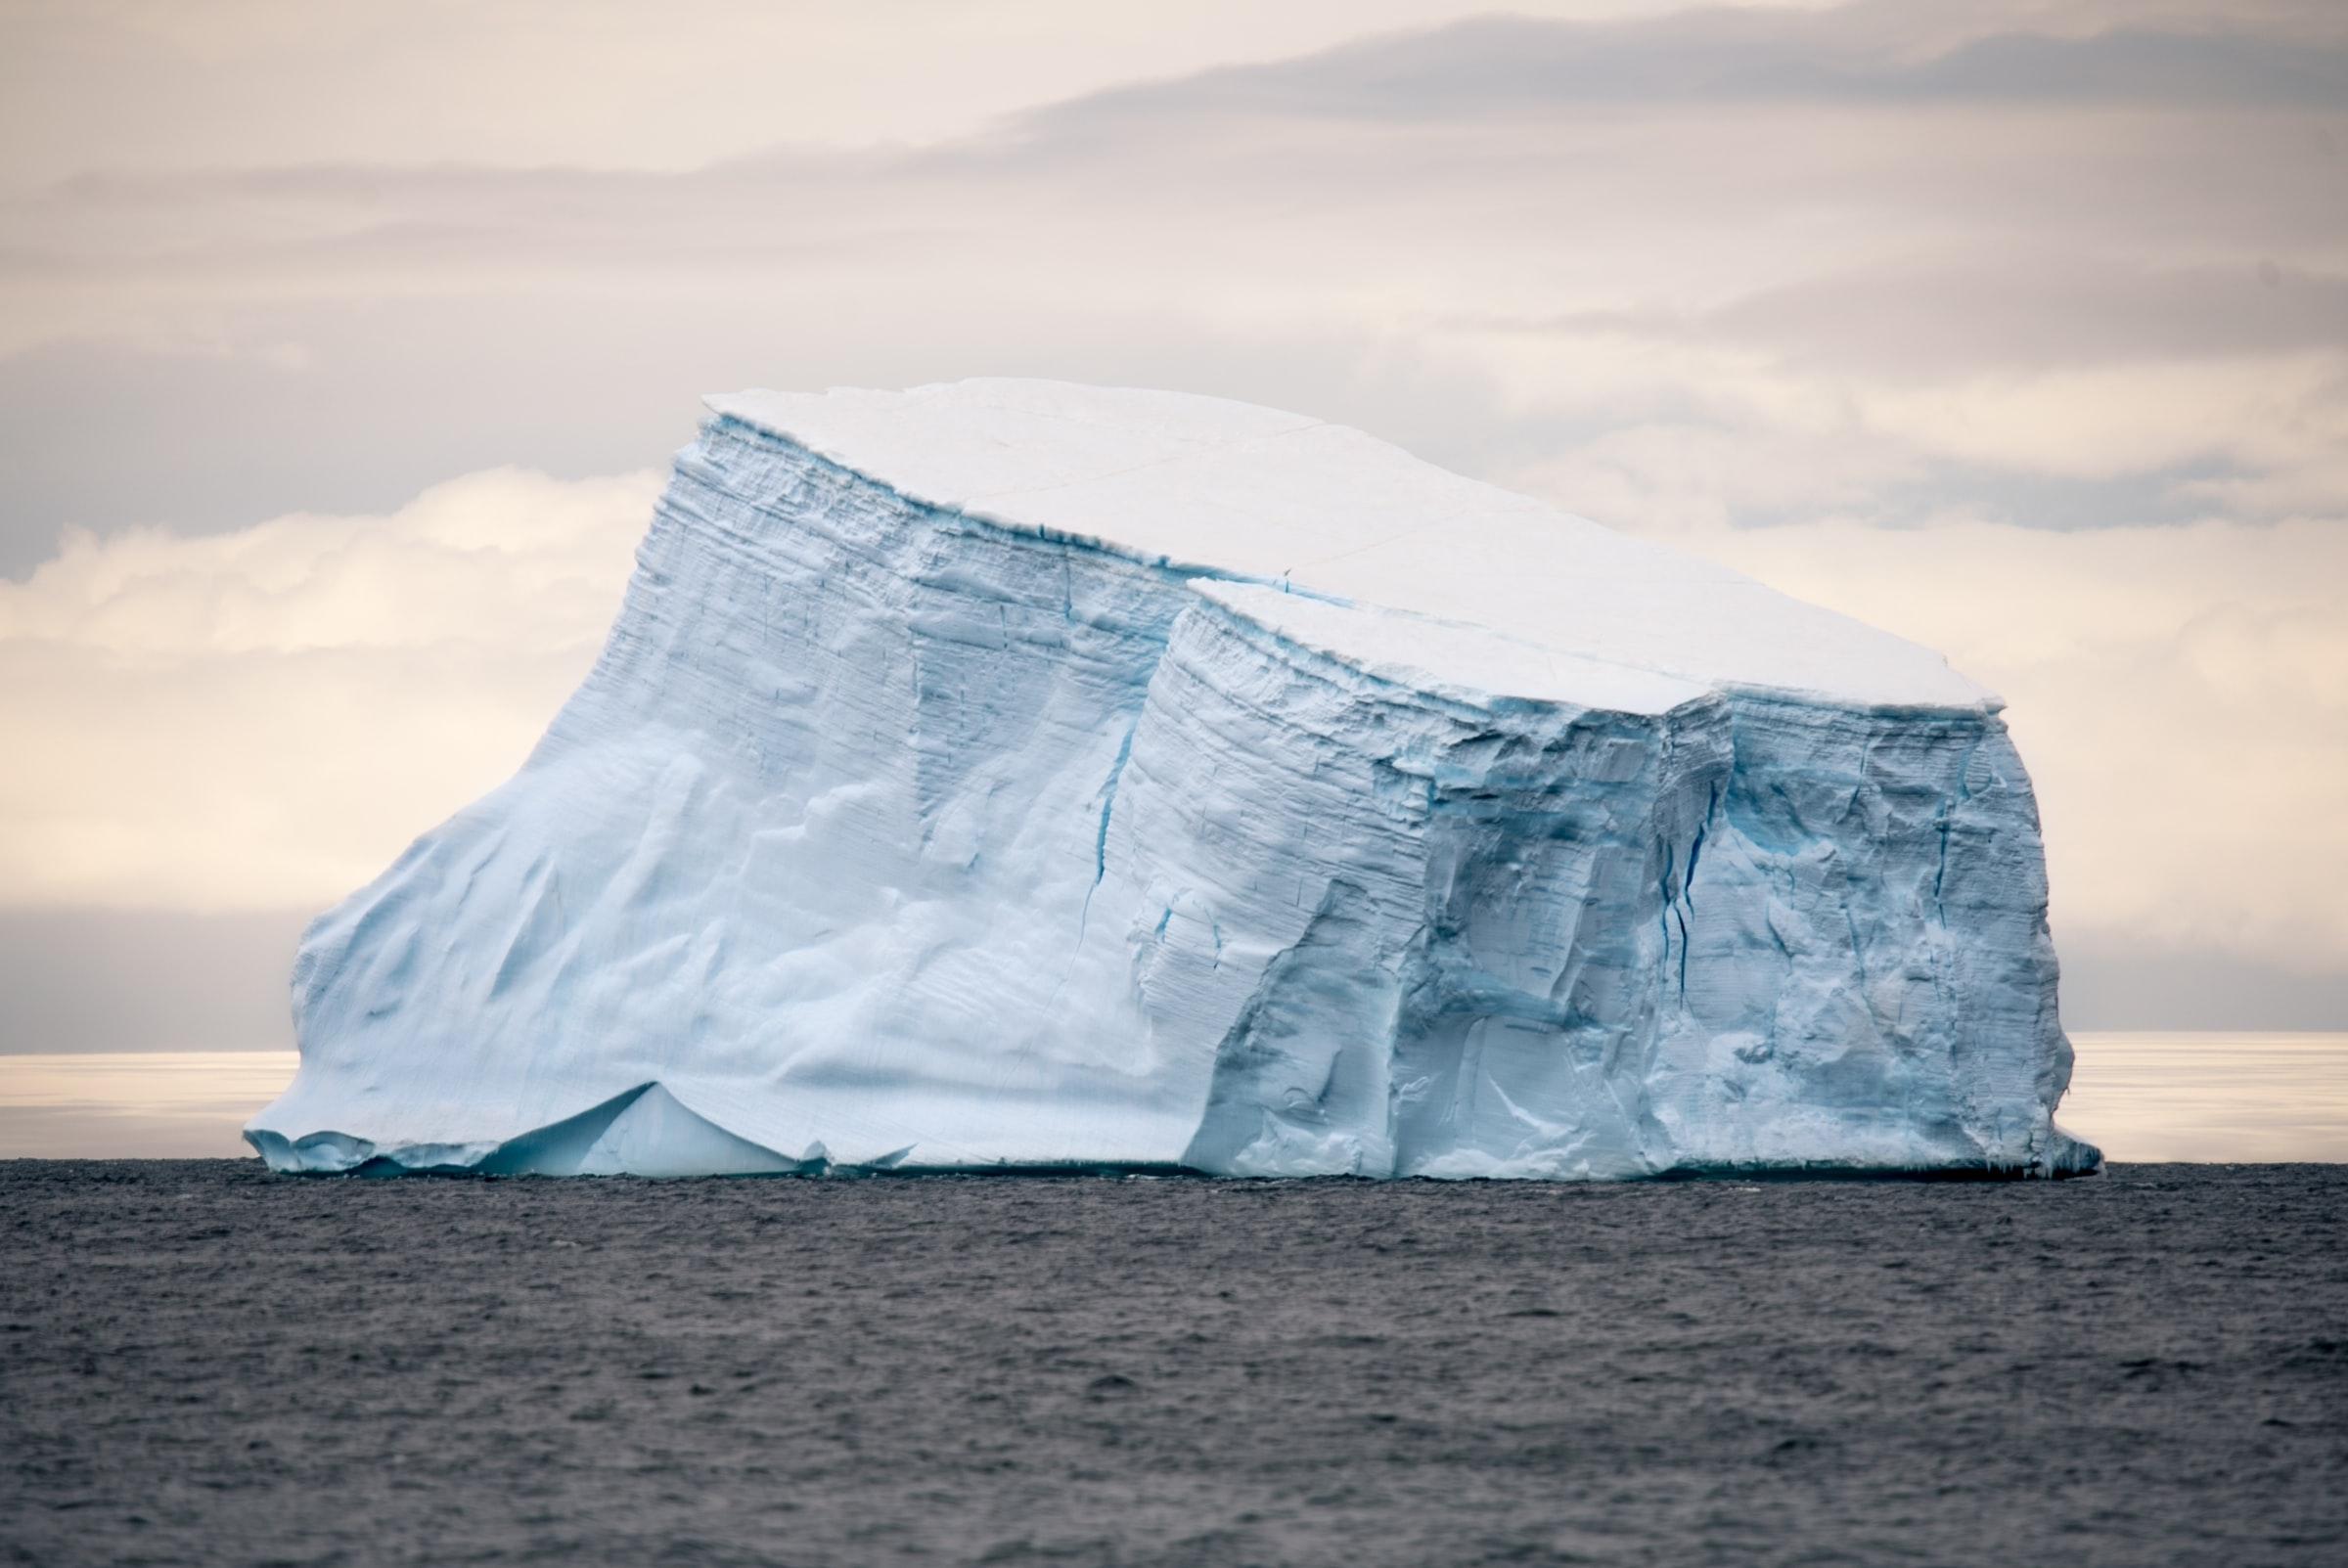 Distributor oversight: the hidden part of the iceberg